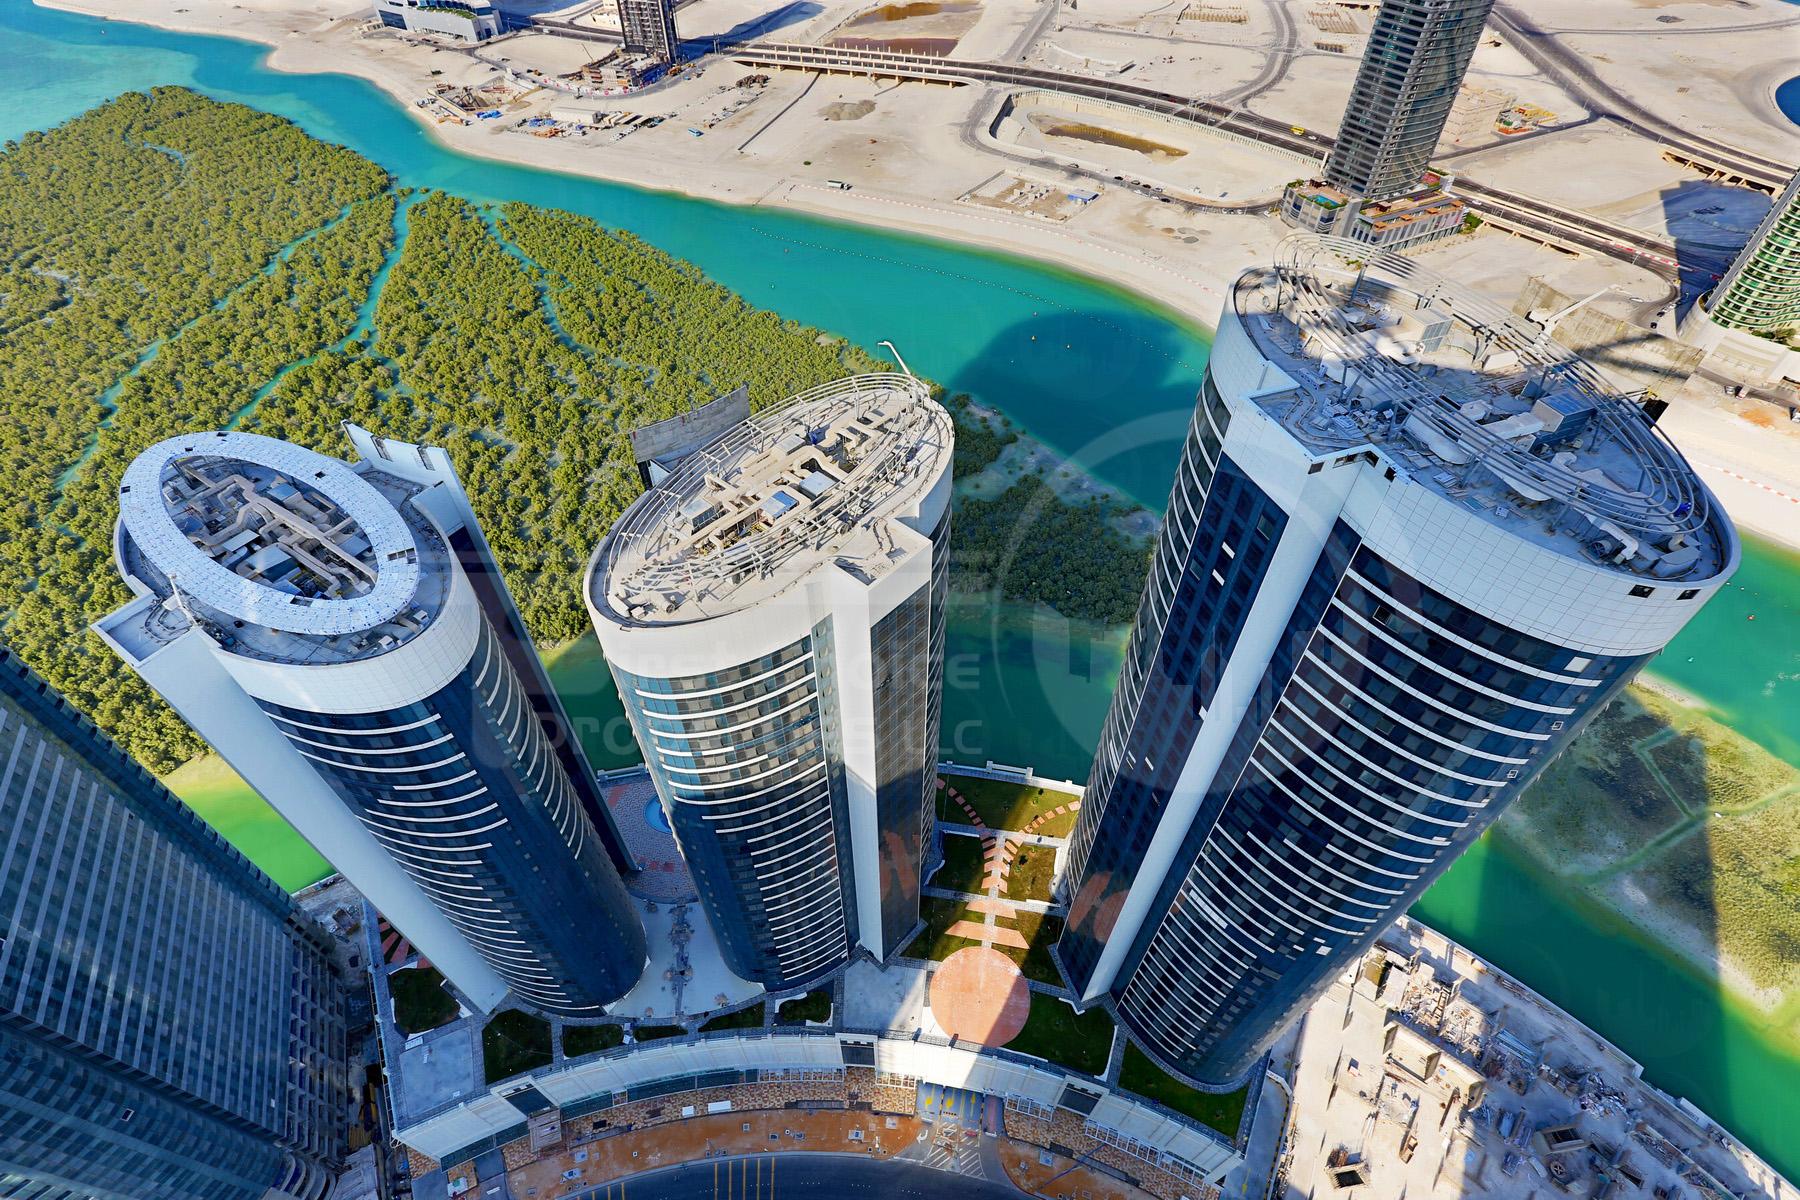 Studio - 1BR - 2BR - 3BR - 4BR Apartment - Abu Dhabi - UAE - Al Reem Island - Hydra Avenue - Outside View (56).JPG